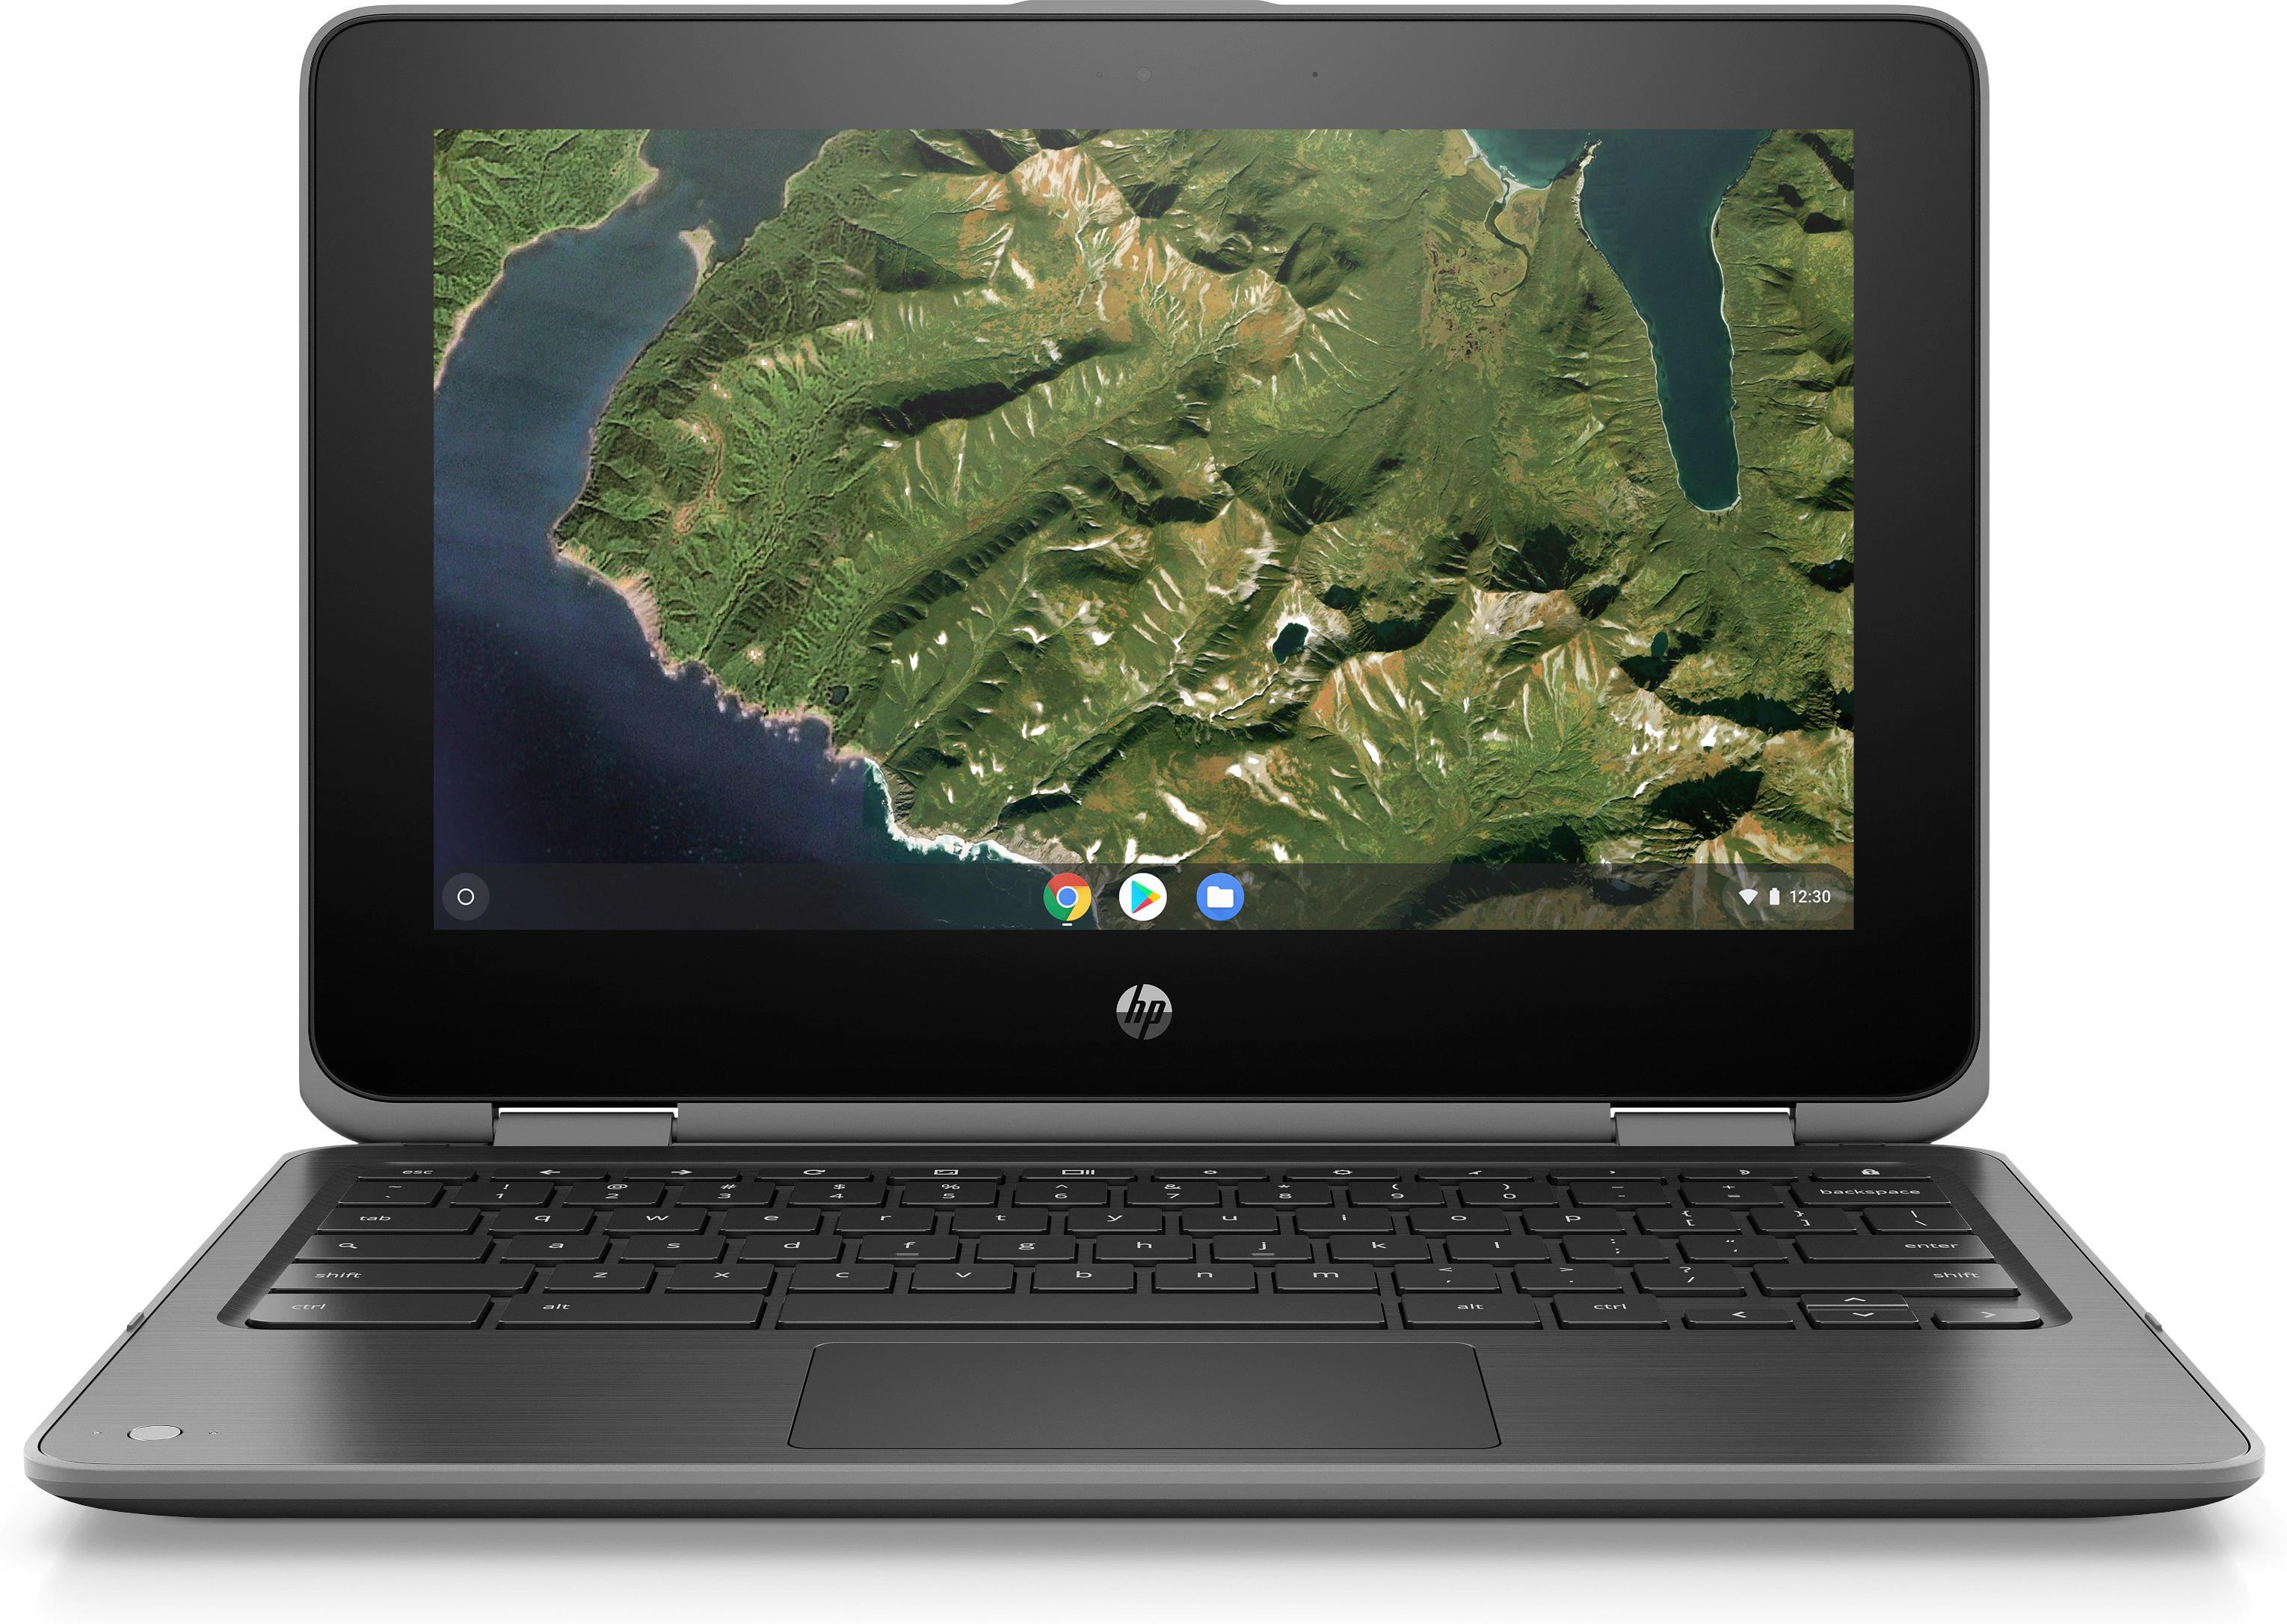 HP Chromebook x360 11 G2 EE (11.6 inch) Notebook PC Celeron (N4000) 1.1GHz 4GB 32GB eMMC Chrome OS (HD Graphics 600)